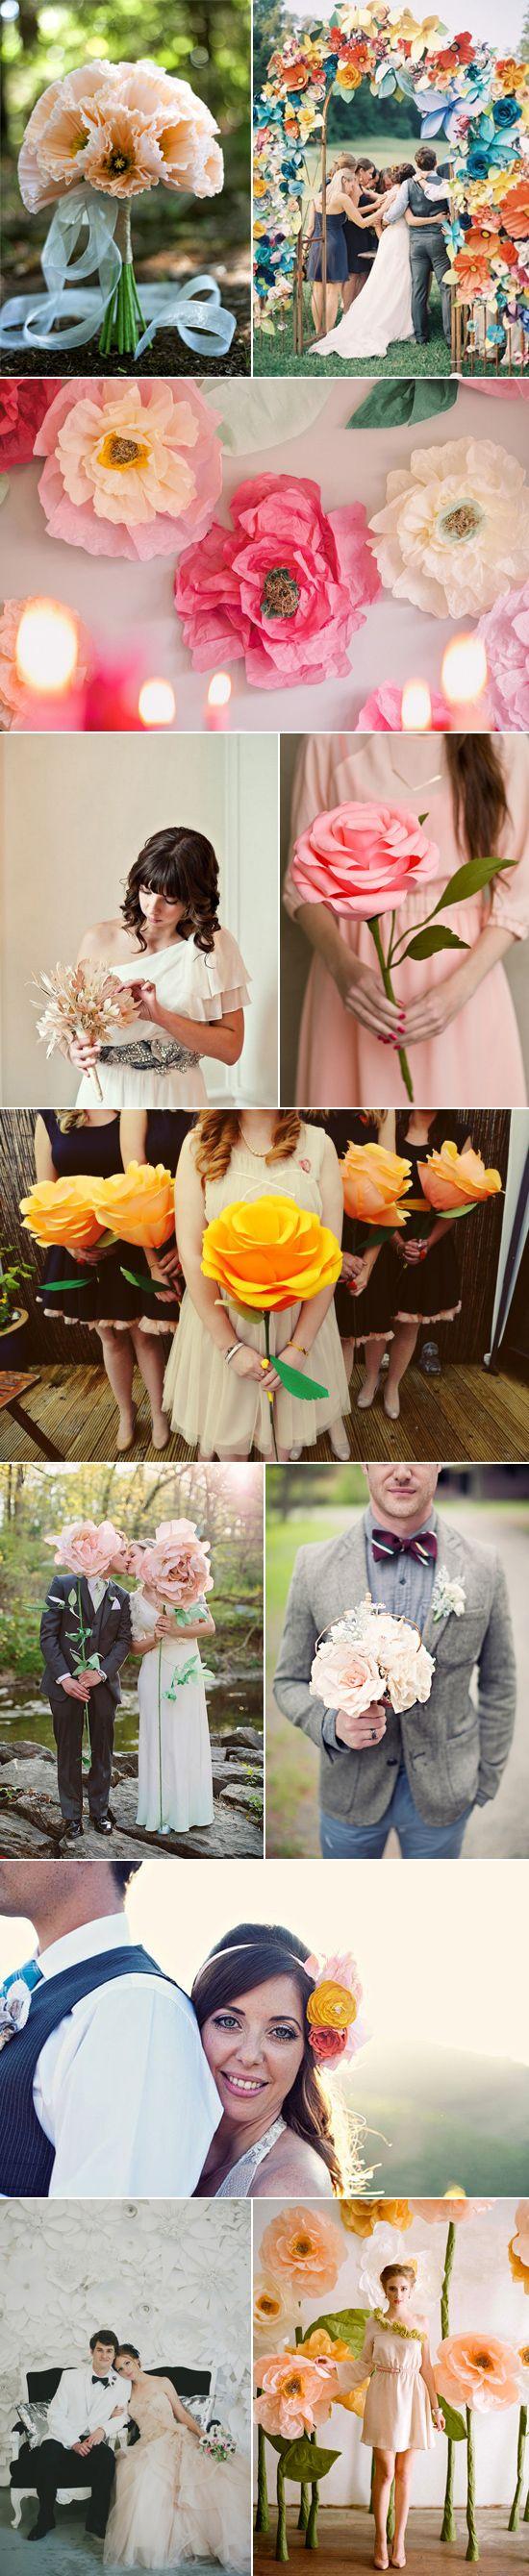 Paper Flower Wedding Ideas - Polka Dot Bride